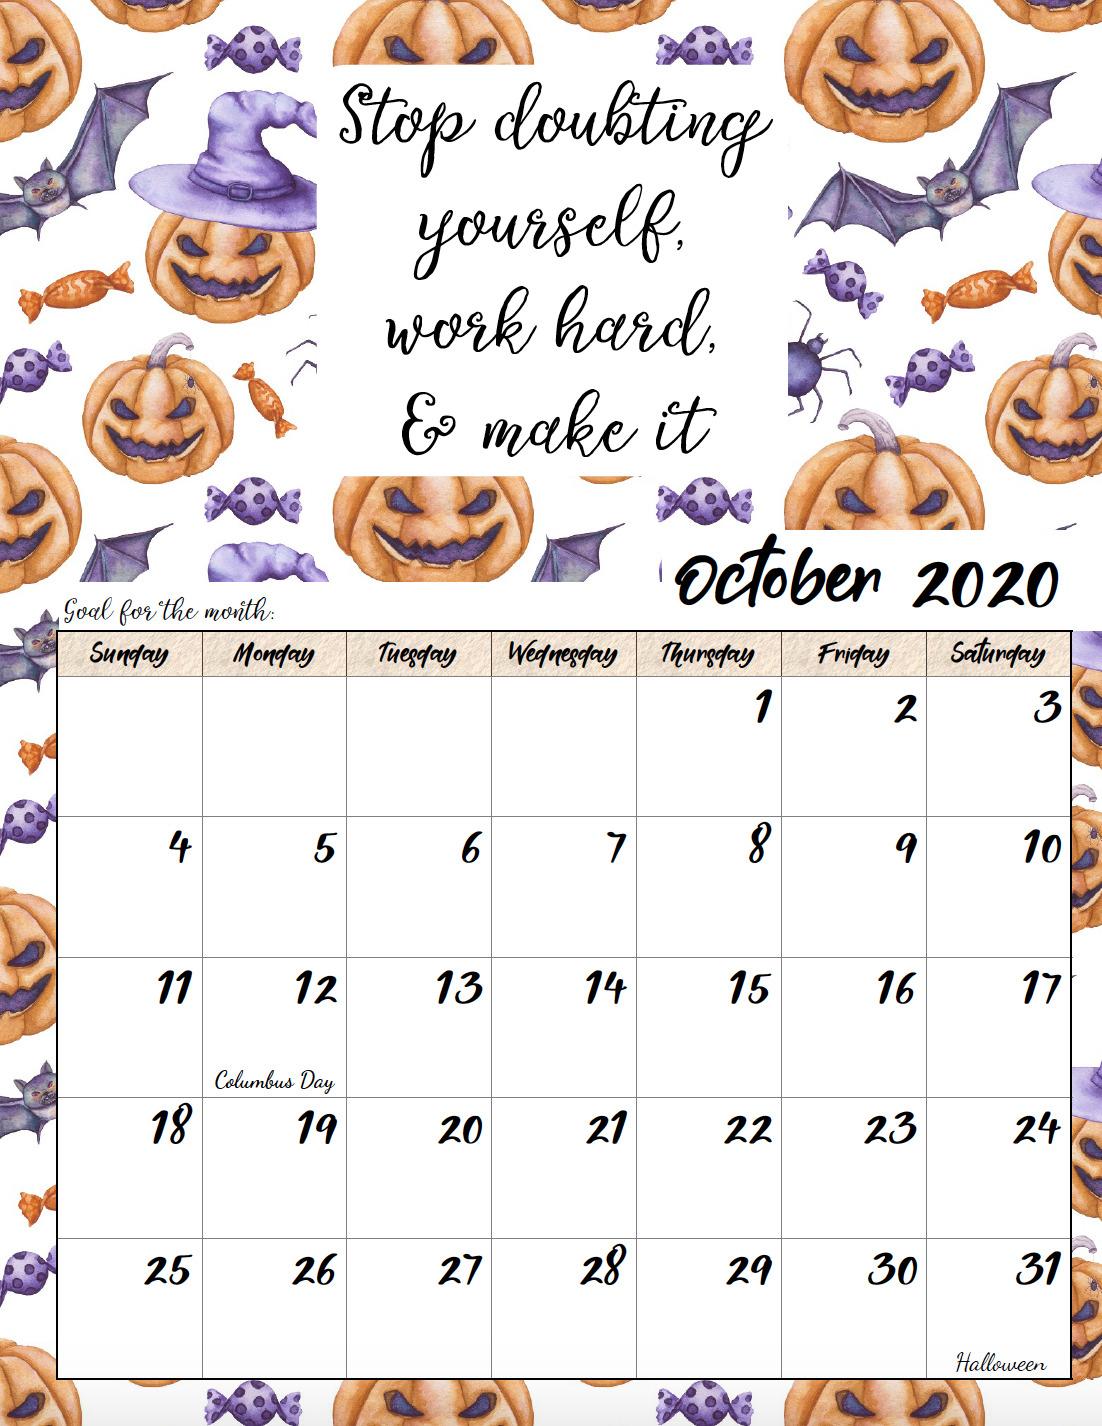 Free printable October 2020 monthly motivational calendar.